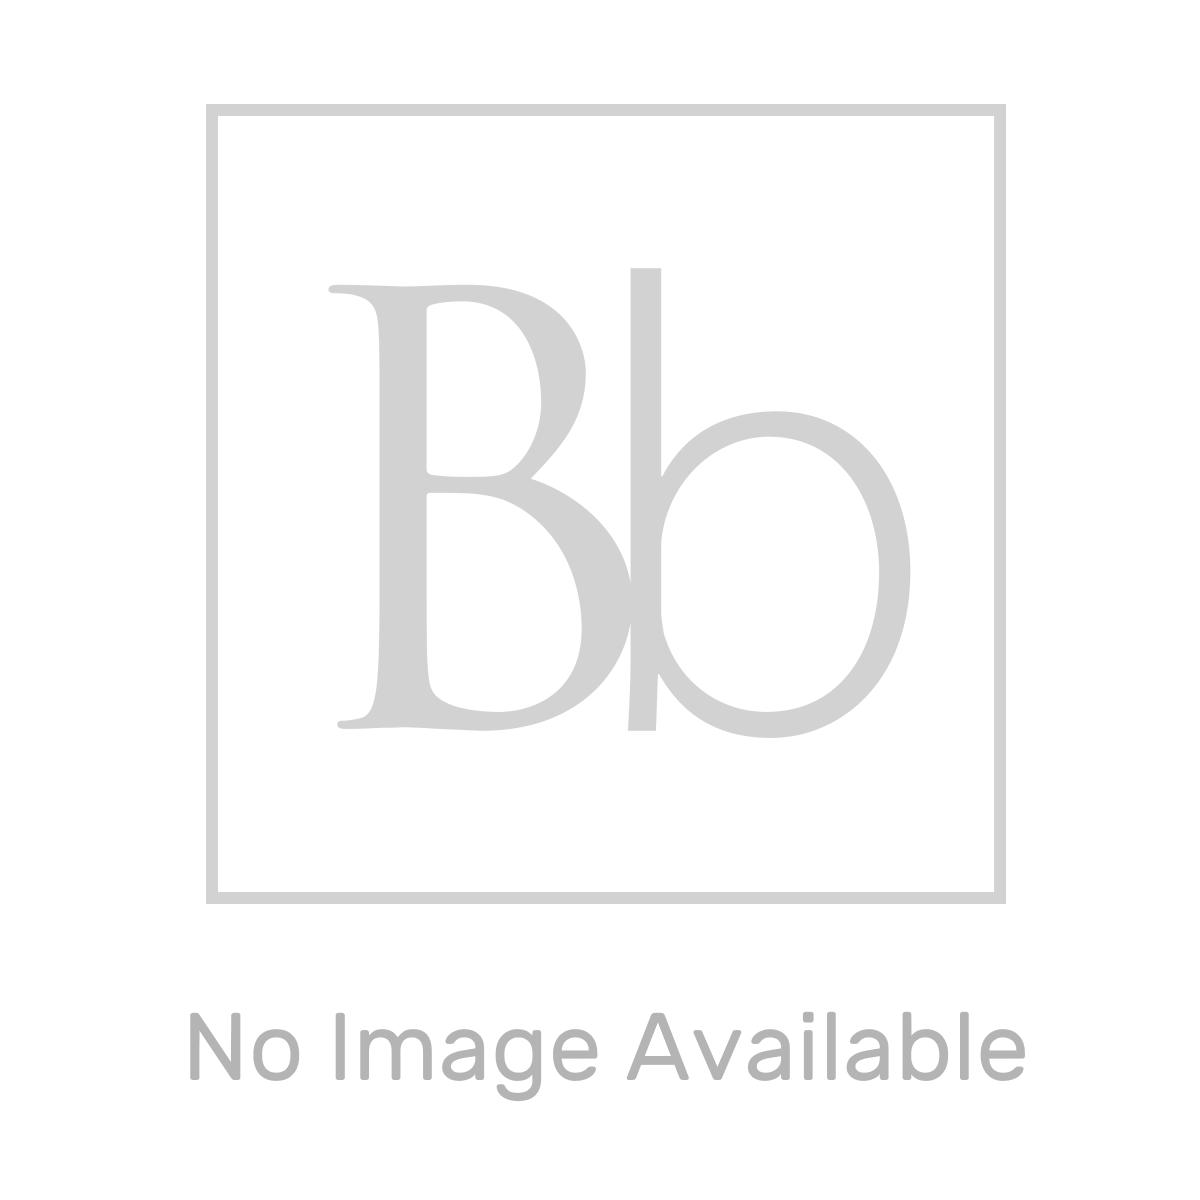 BTL White Laurus² Fully Shrouded Close Coupled Toilet Line Drawing